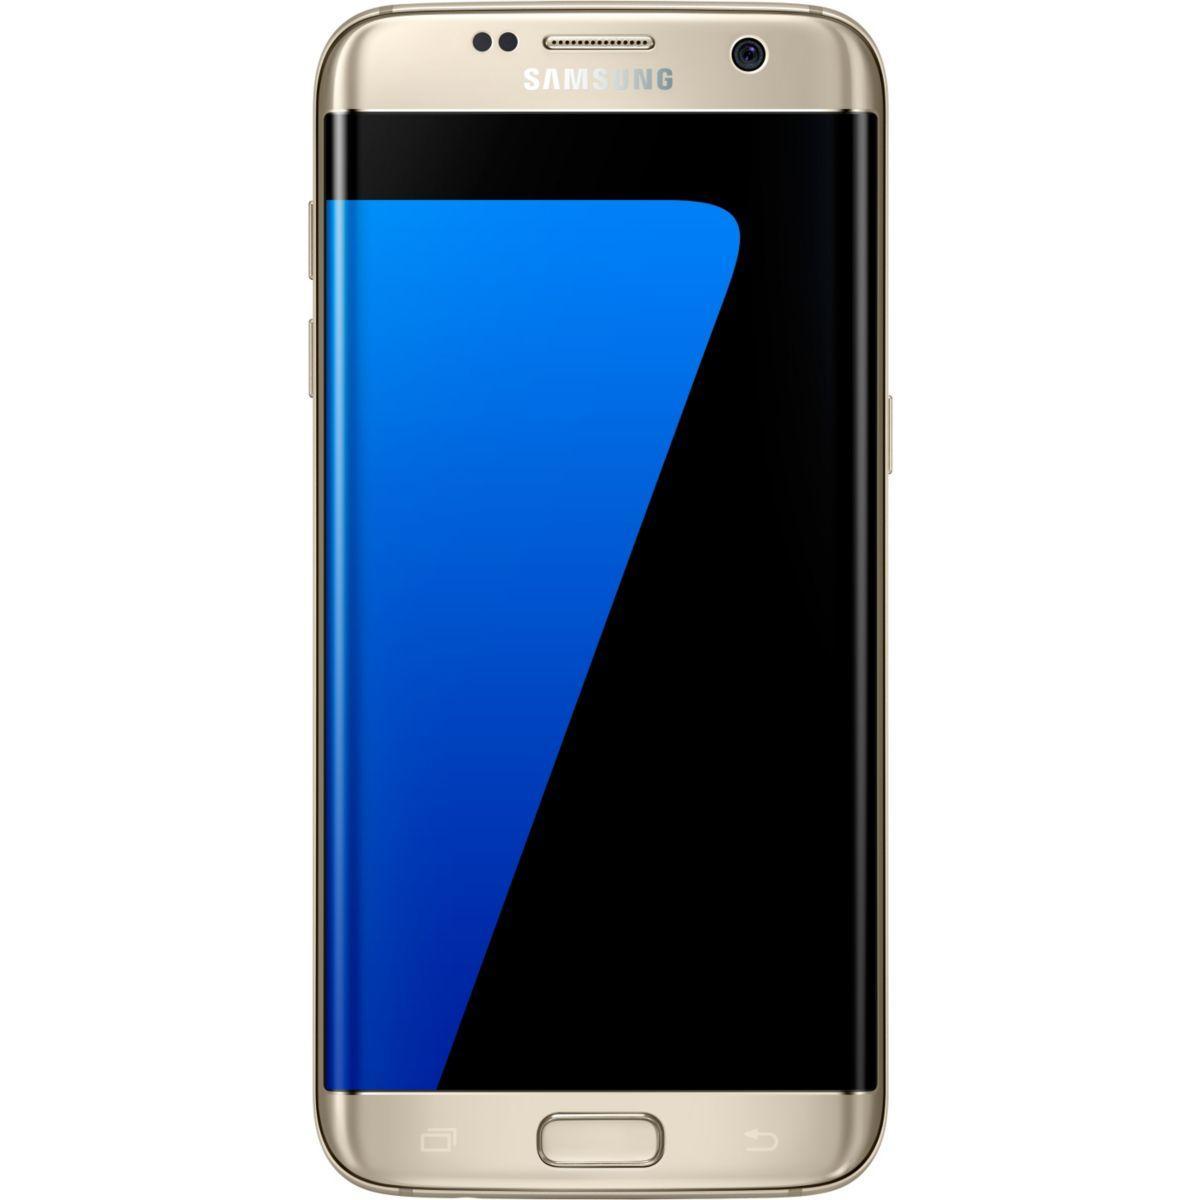 Pack promo smartphone samsung galaxy s7 edge or 32 go + etui samsung flip wallet galaxy s7 edge gold - soldes et bonnes affaires à prix imbattables